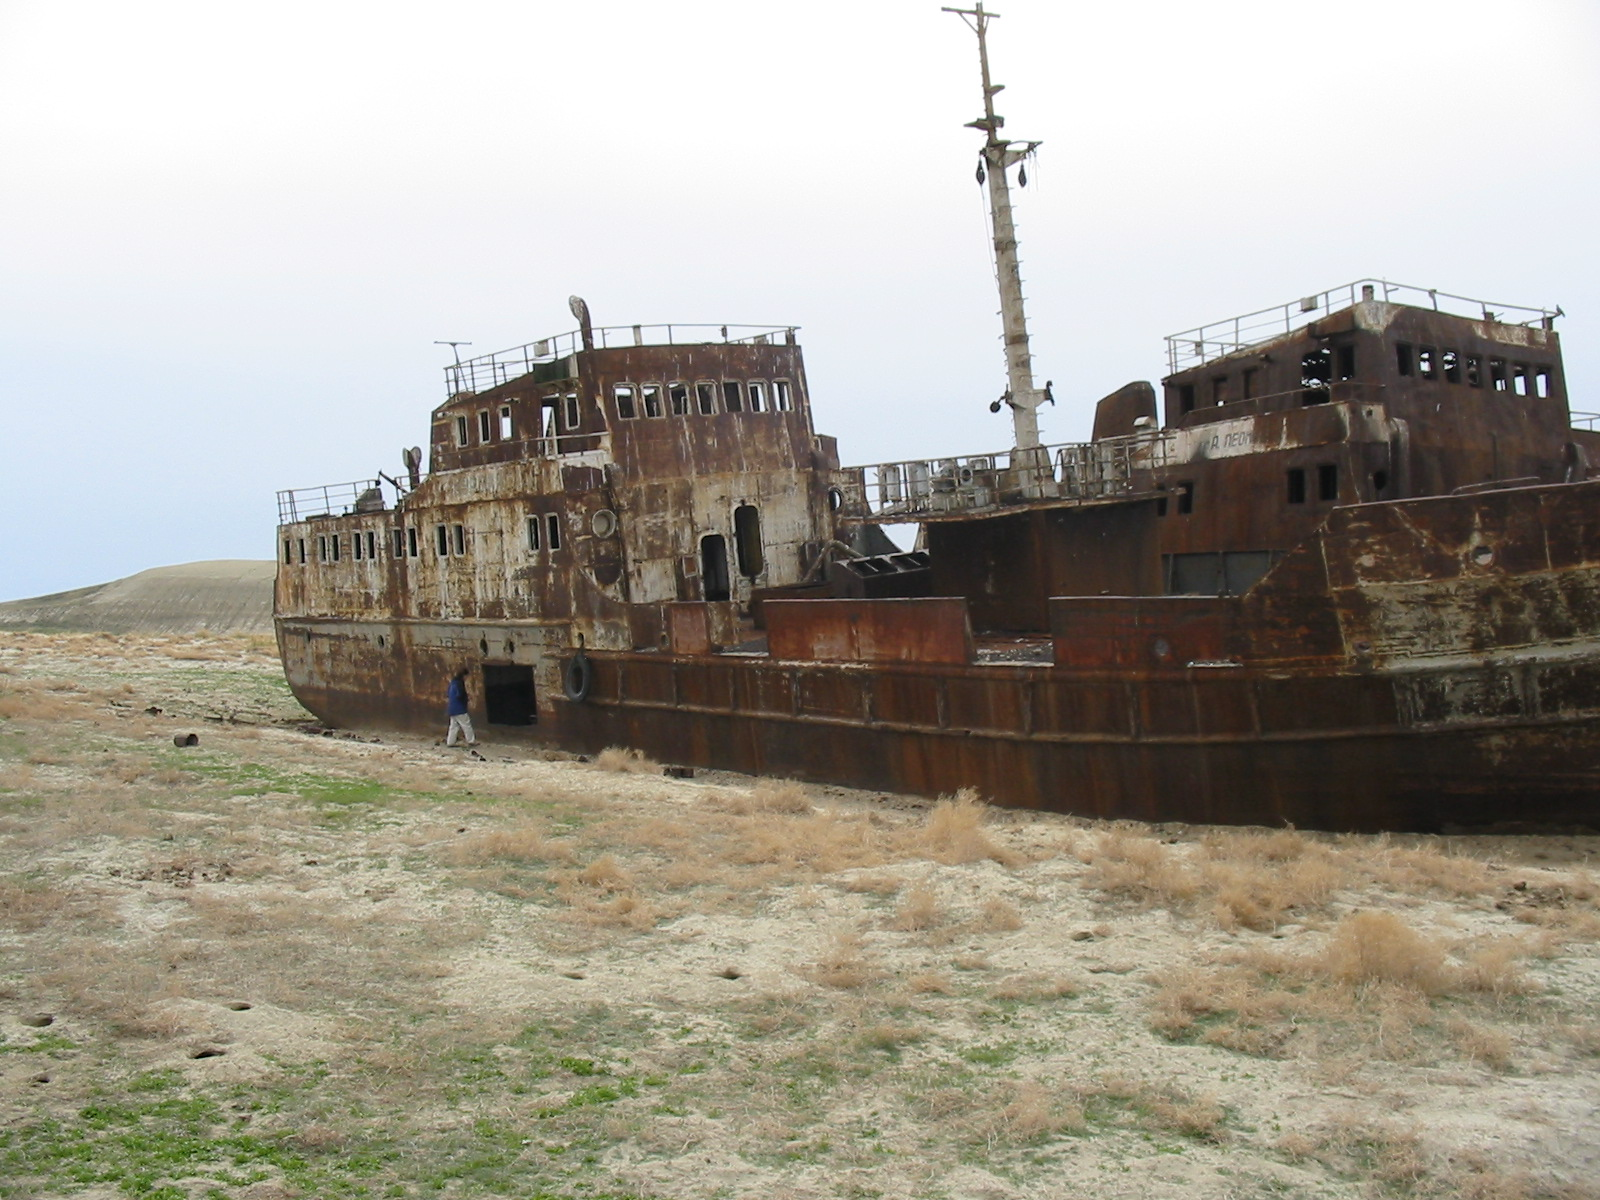 No name ship wrecks – World Ship Wrecks